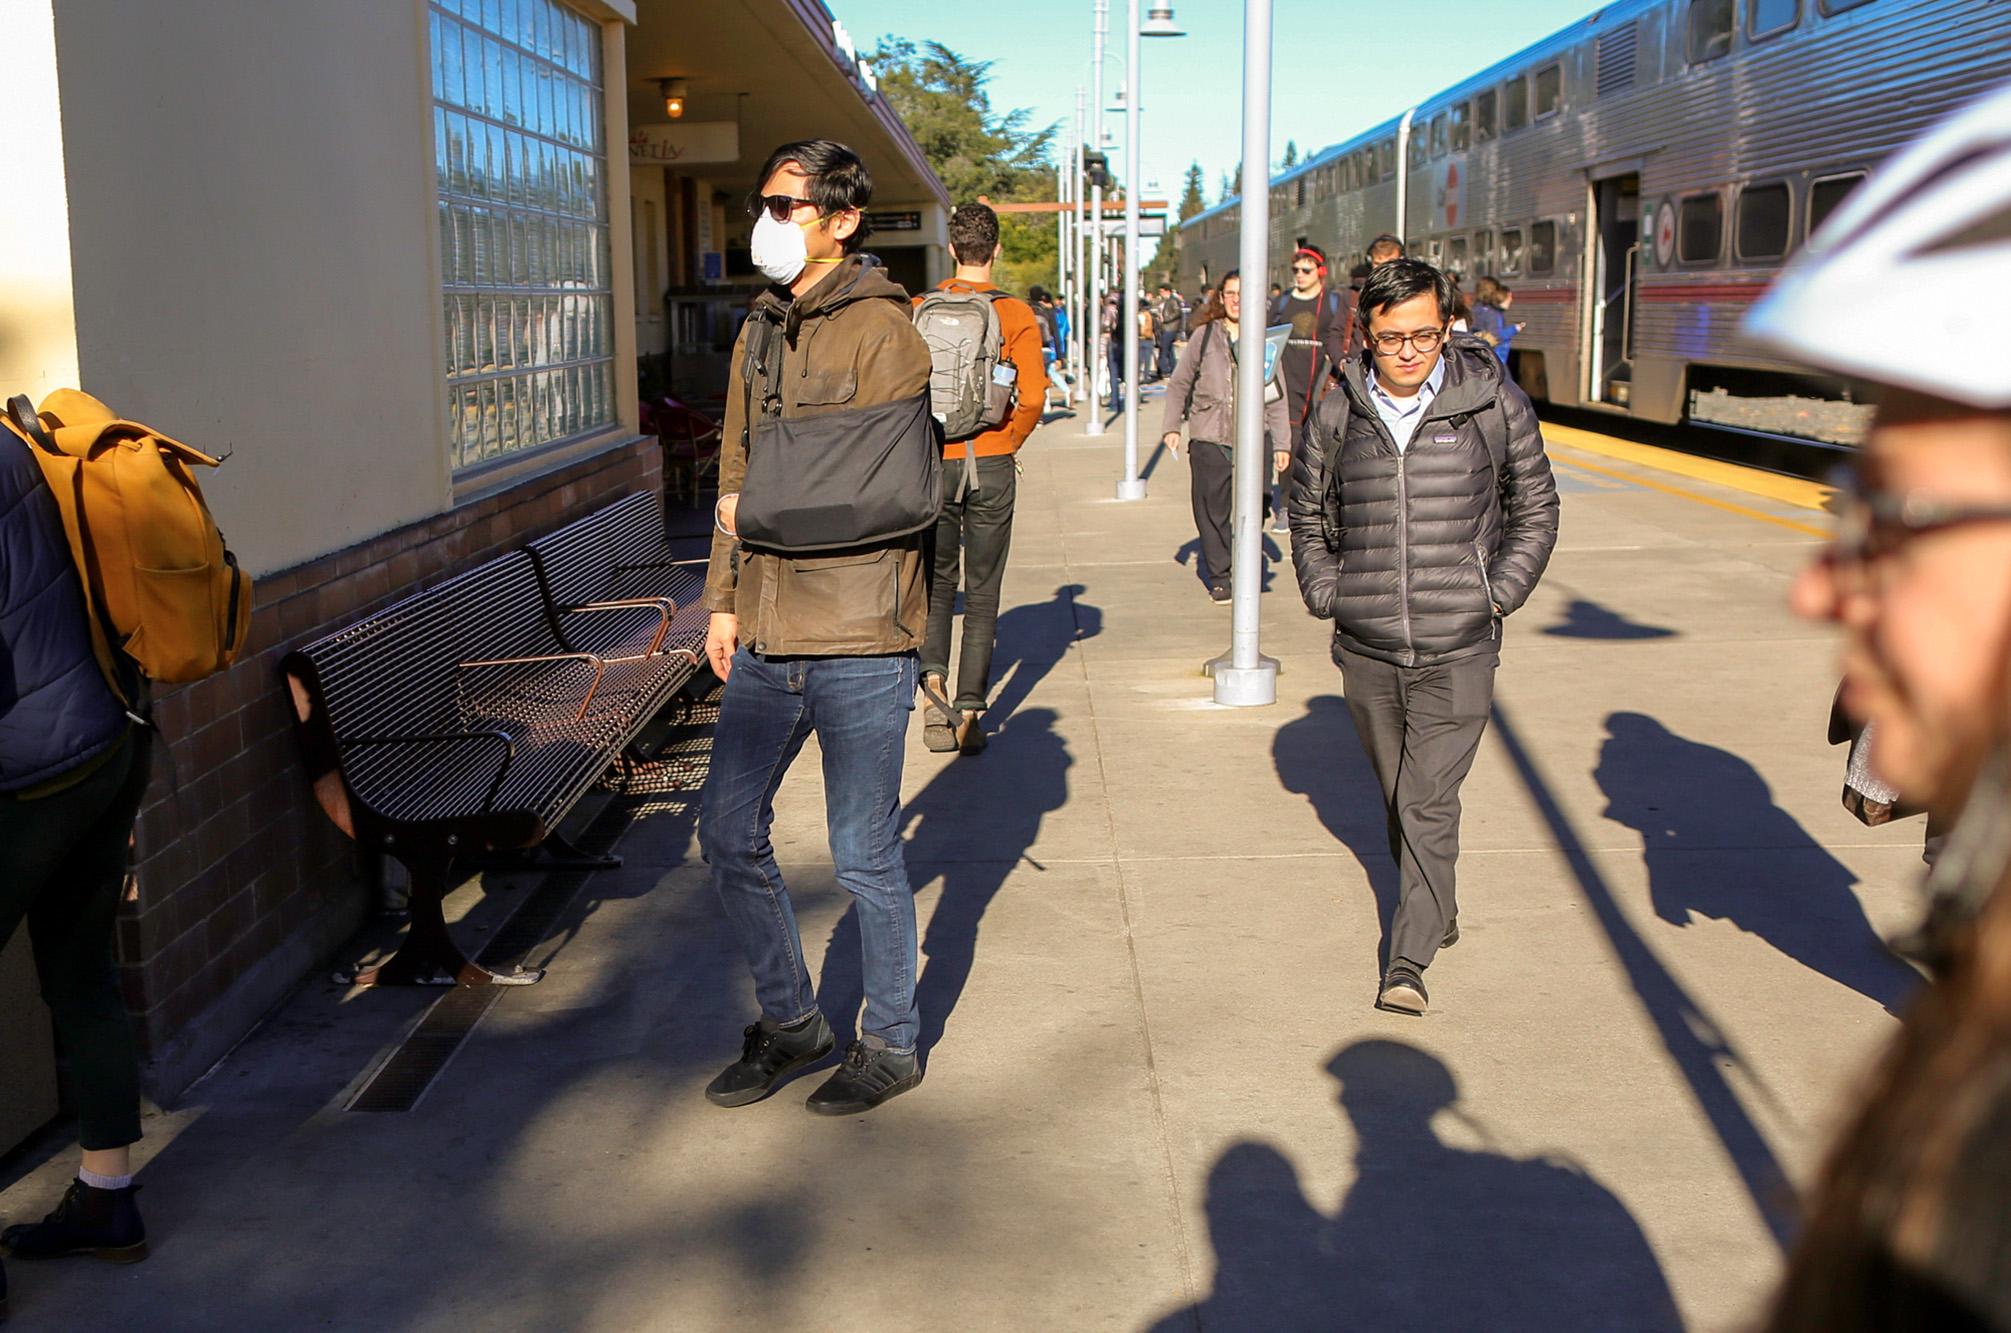 Two cases of coronavirus confirmed in Santa Clara County | News ...